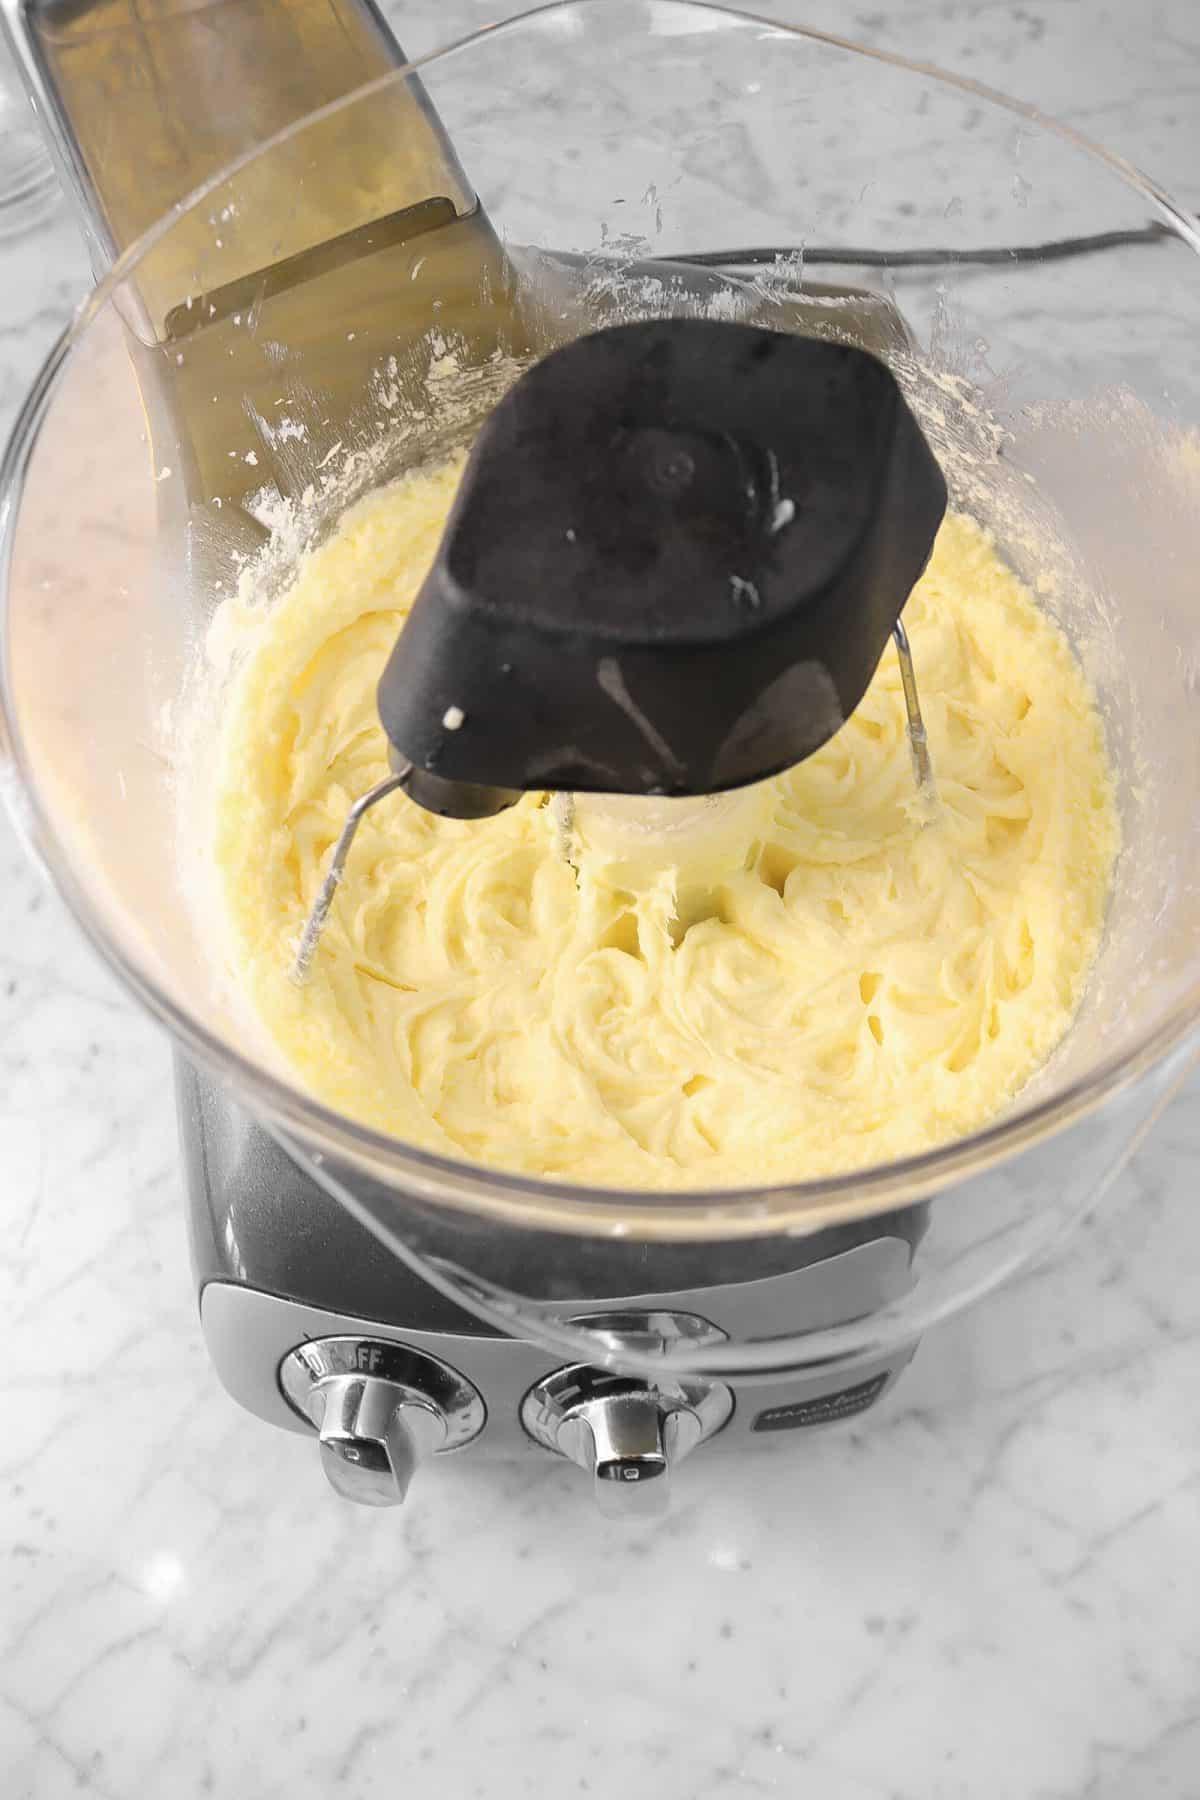 butter, egg, and sugar mixture beaten until light and fluffy